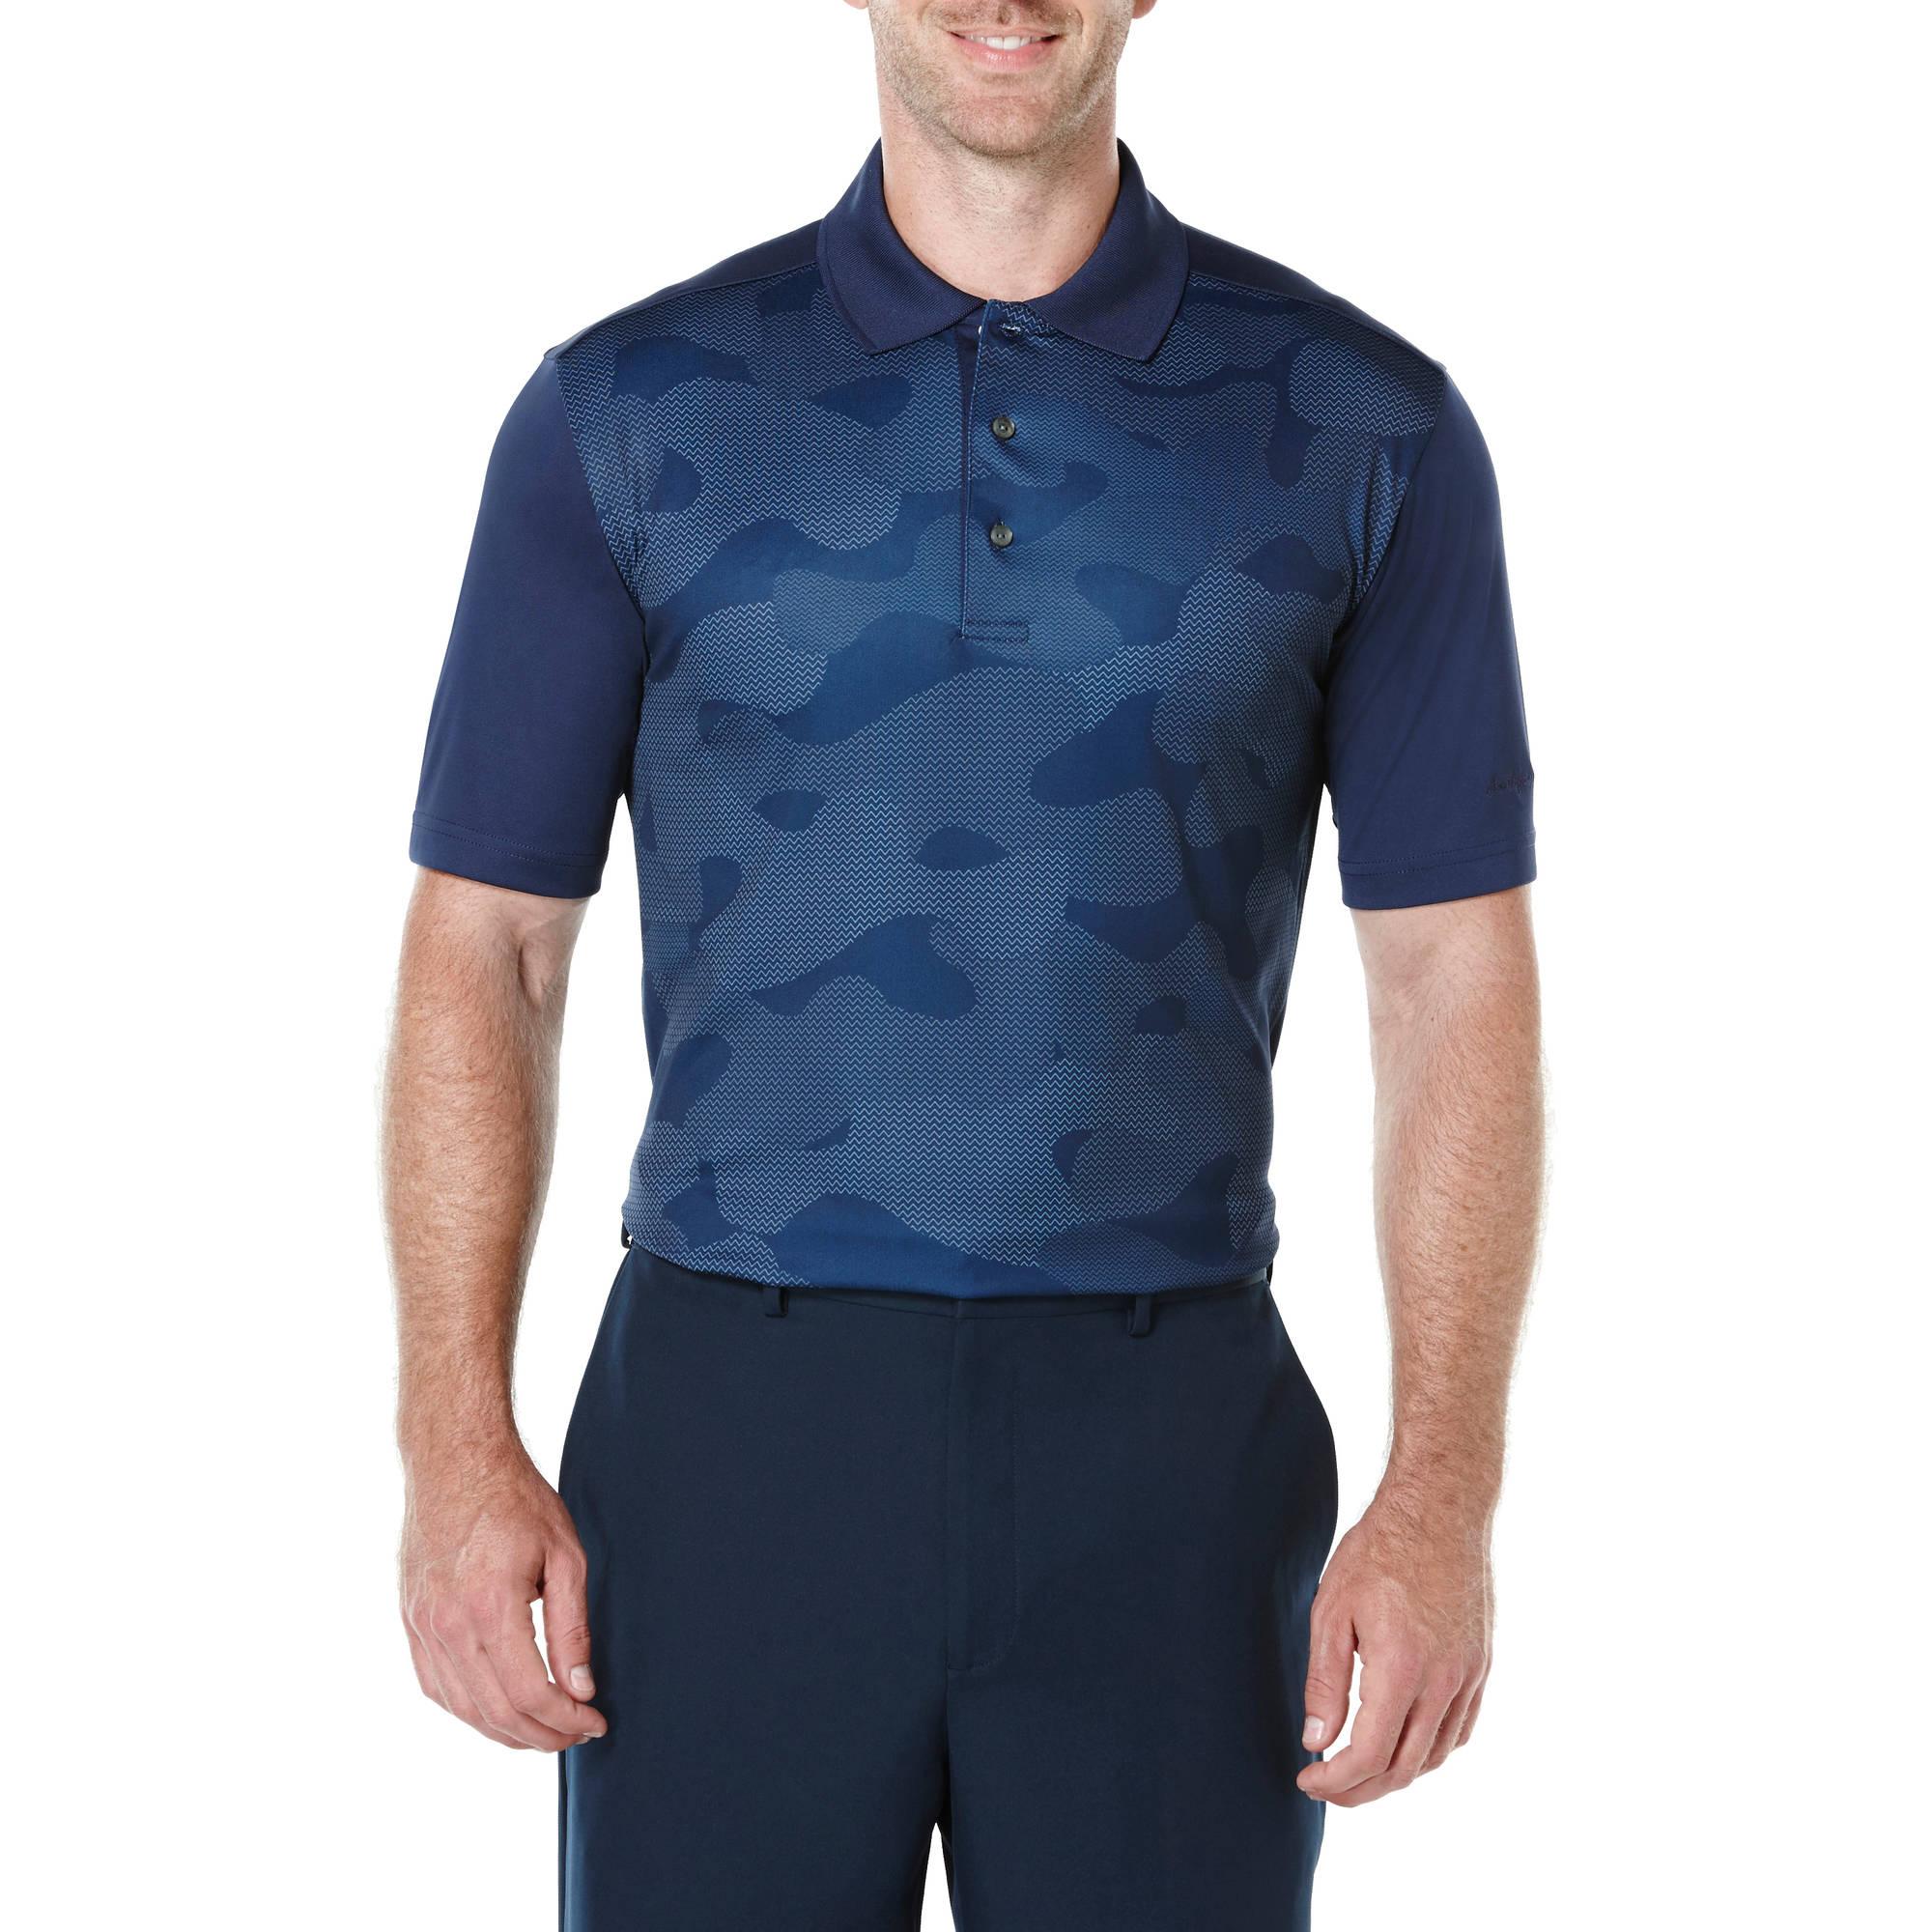 Ben Hogan Performance Big Men's Camouflage Print Polo Shirt